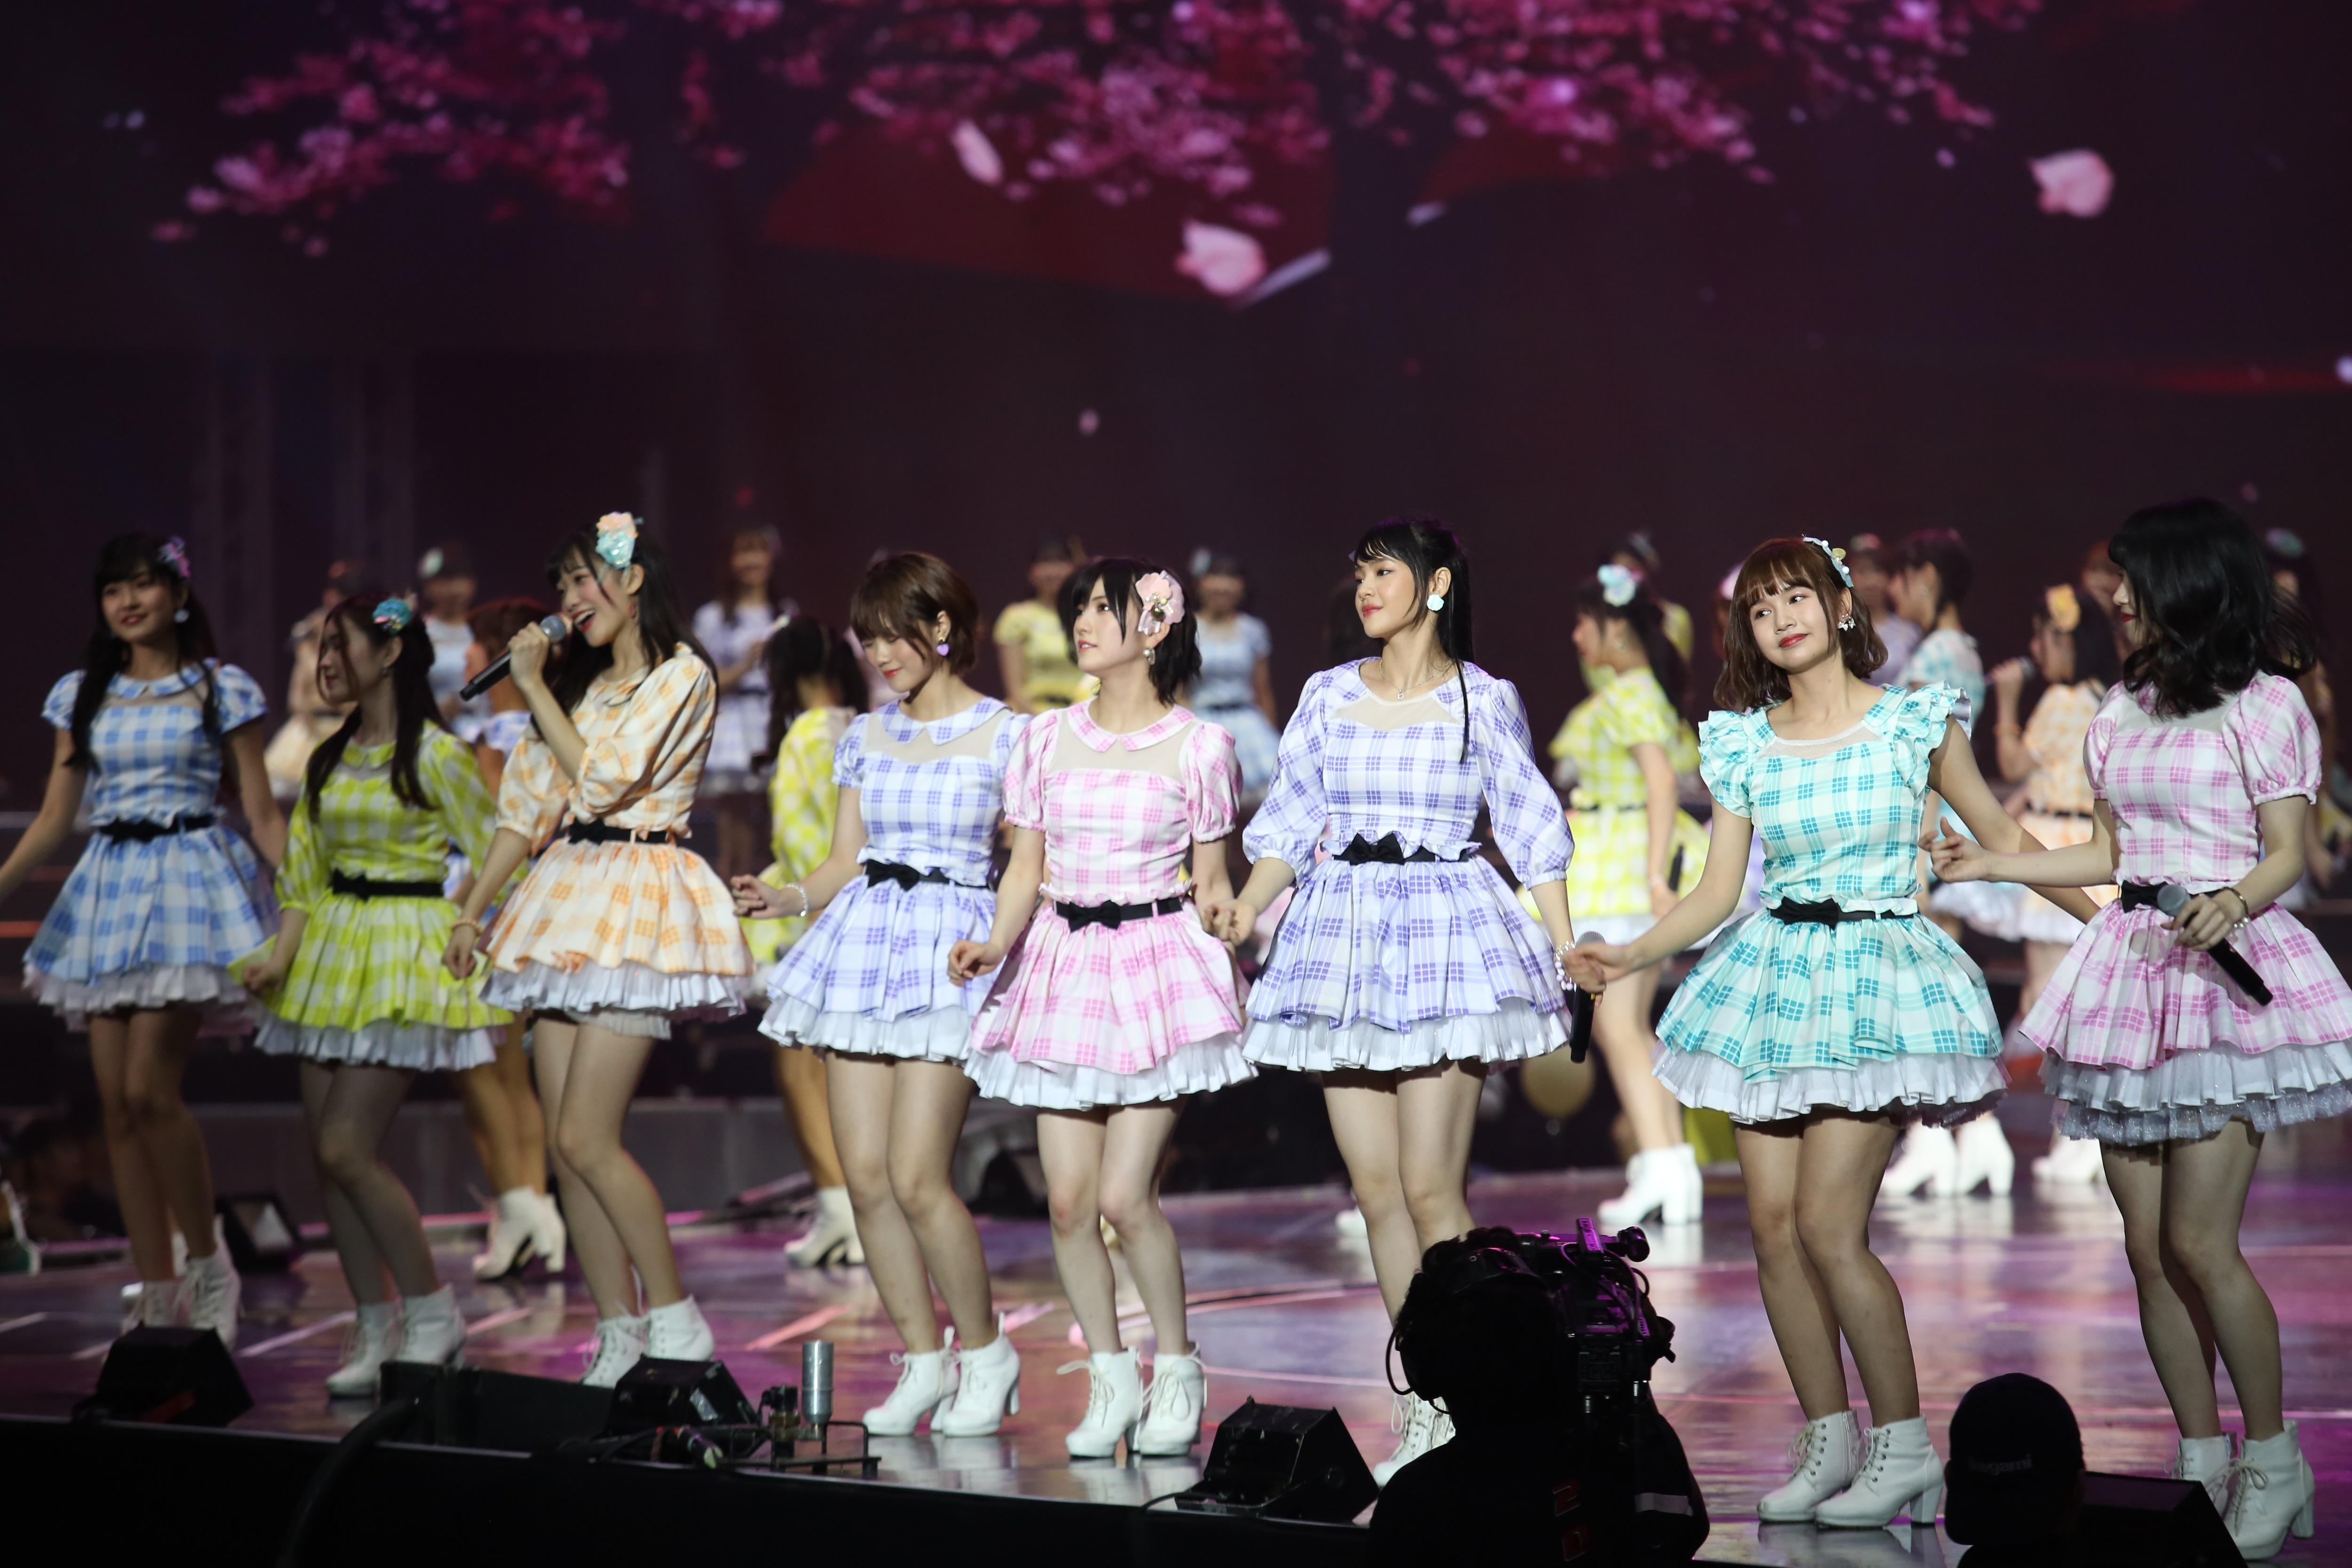 AKB48ほか、海外の姉妹グループが集結し『恋するフォーチュンクッキー』を熱唱!【写真23枚】の画像009